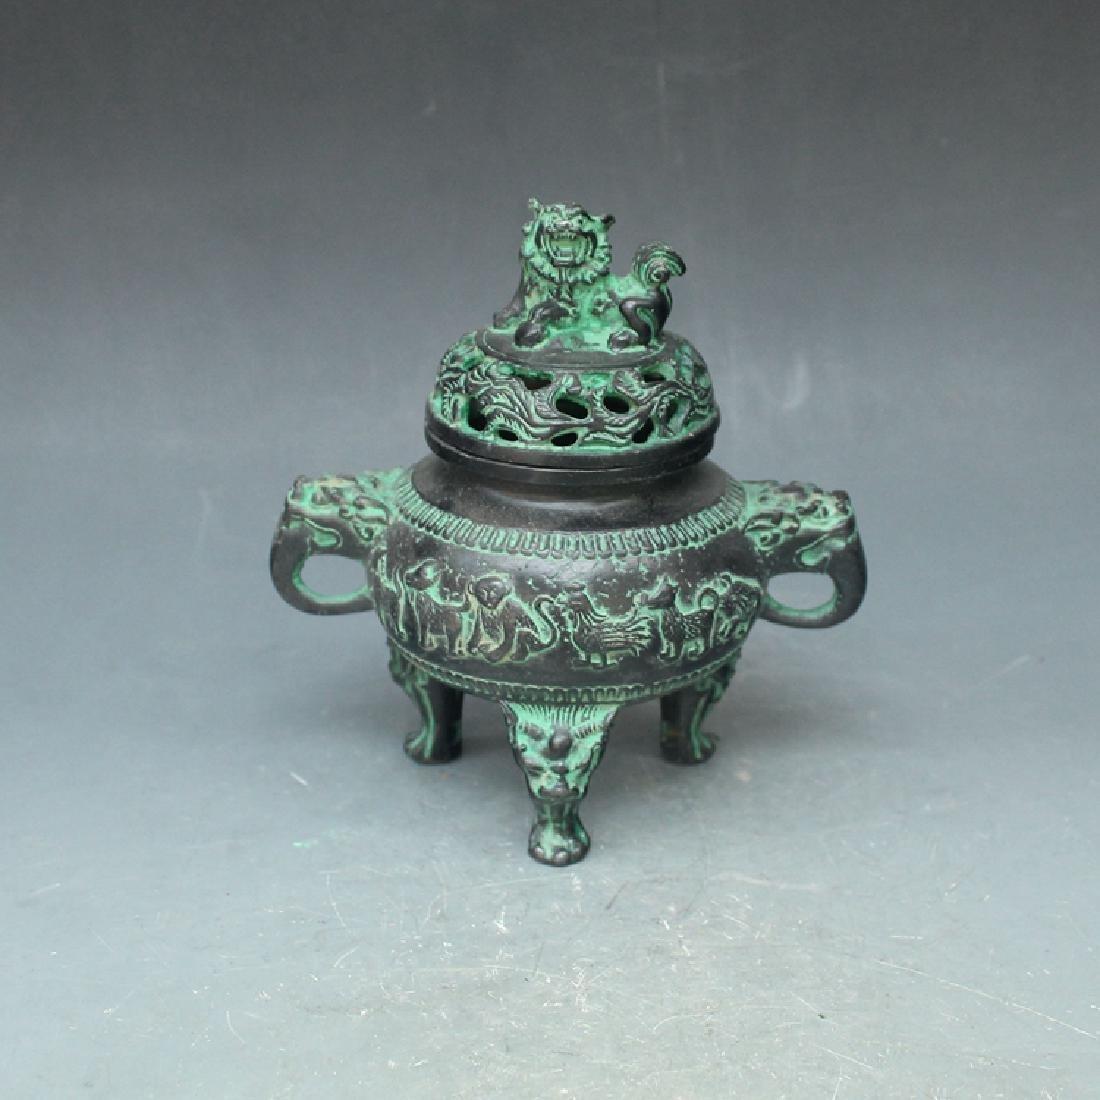 Chinese Antique Bronze Incense Burner